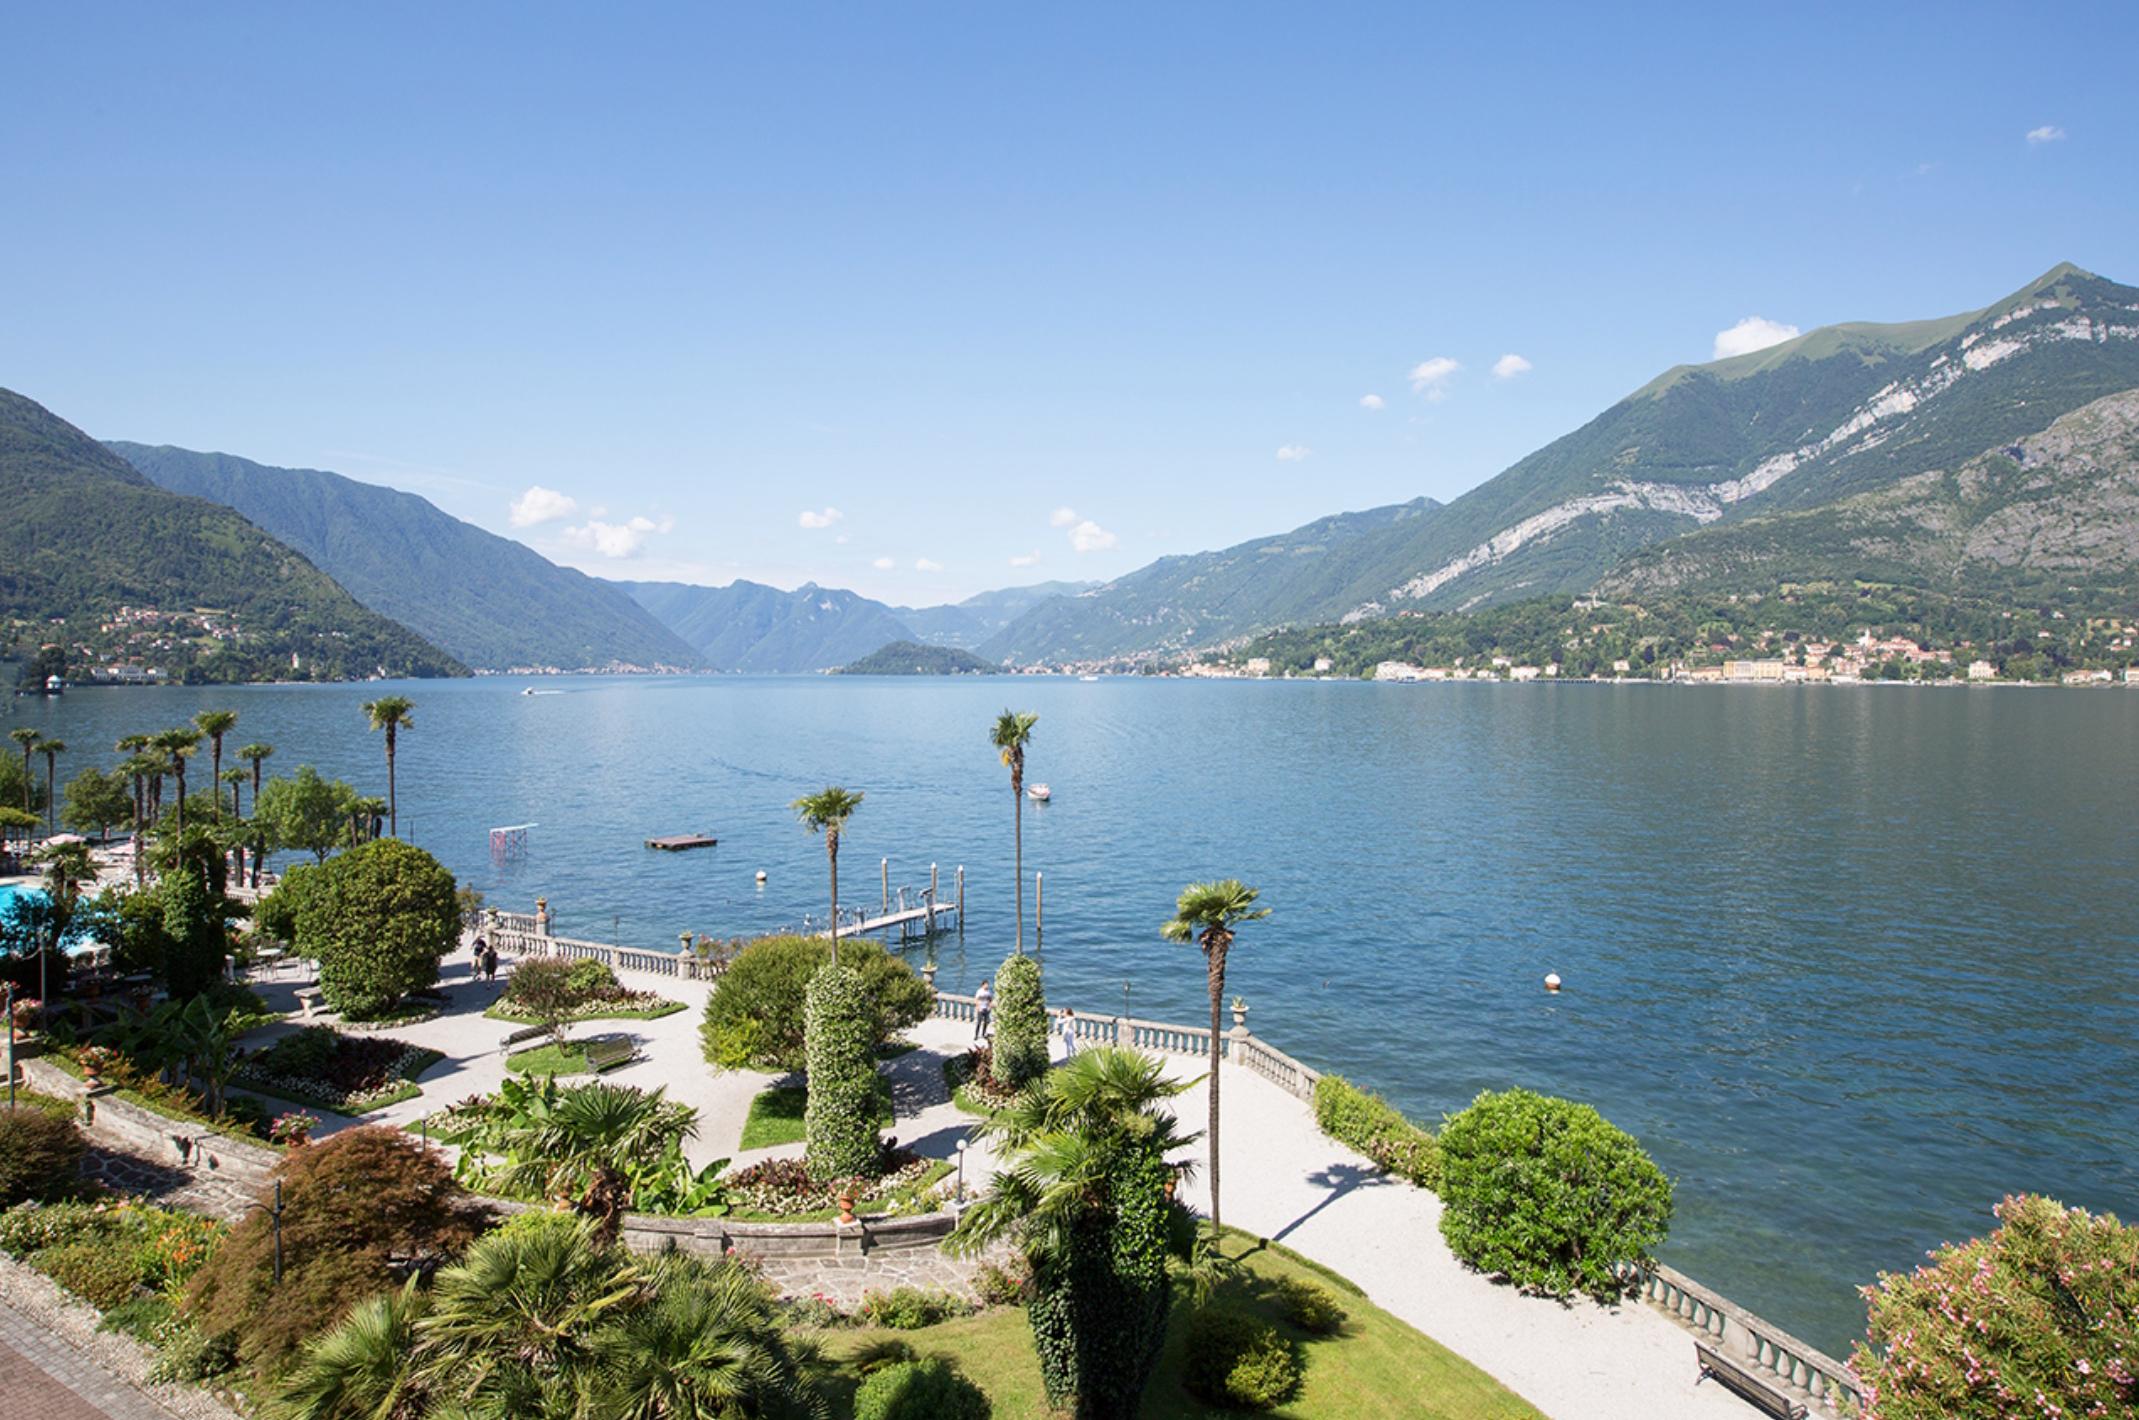 Destination: Bellagio, Lake Como, Italy